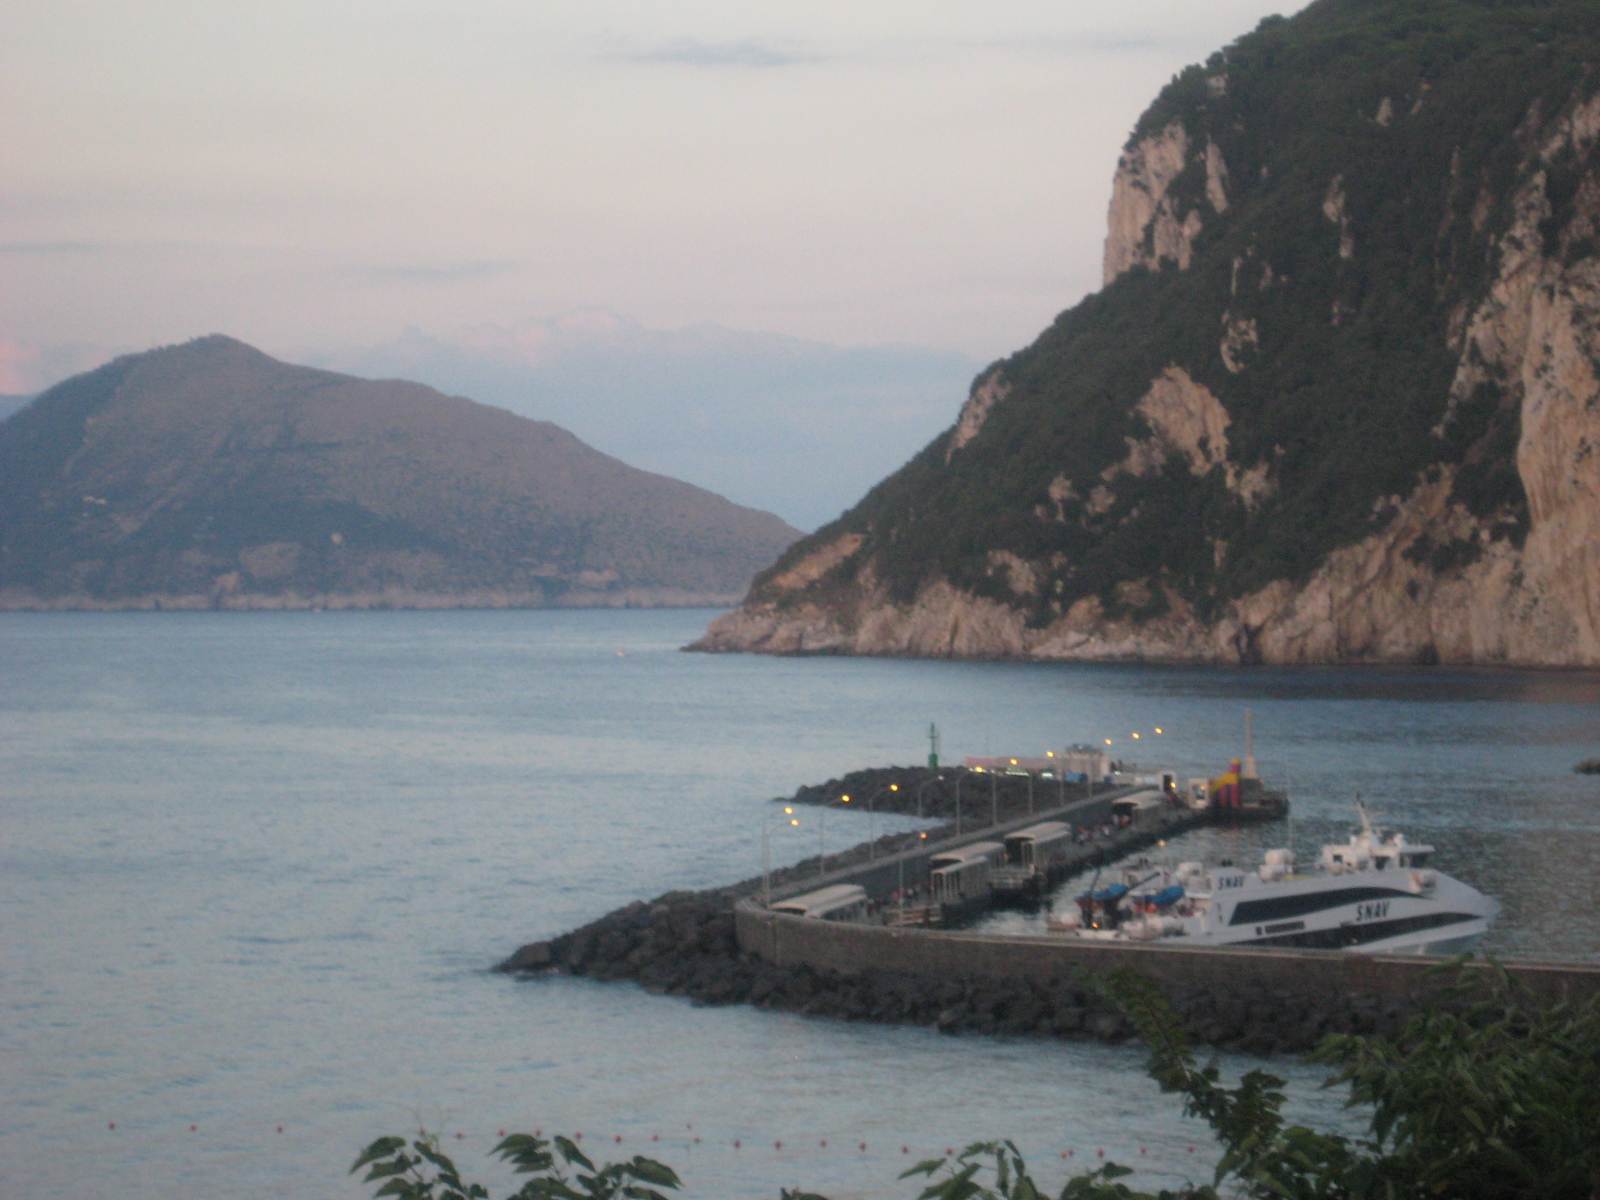 Capri, Italy 1